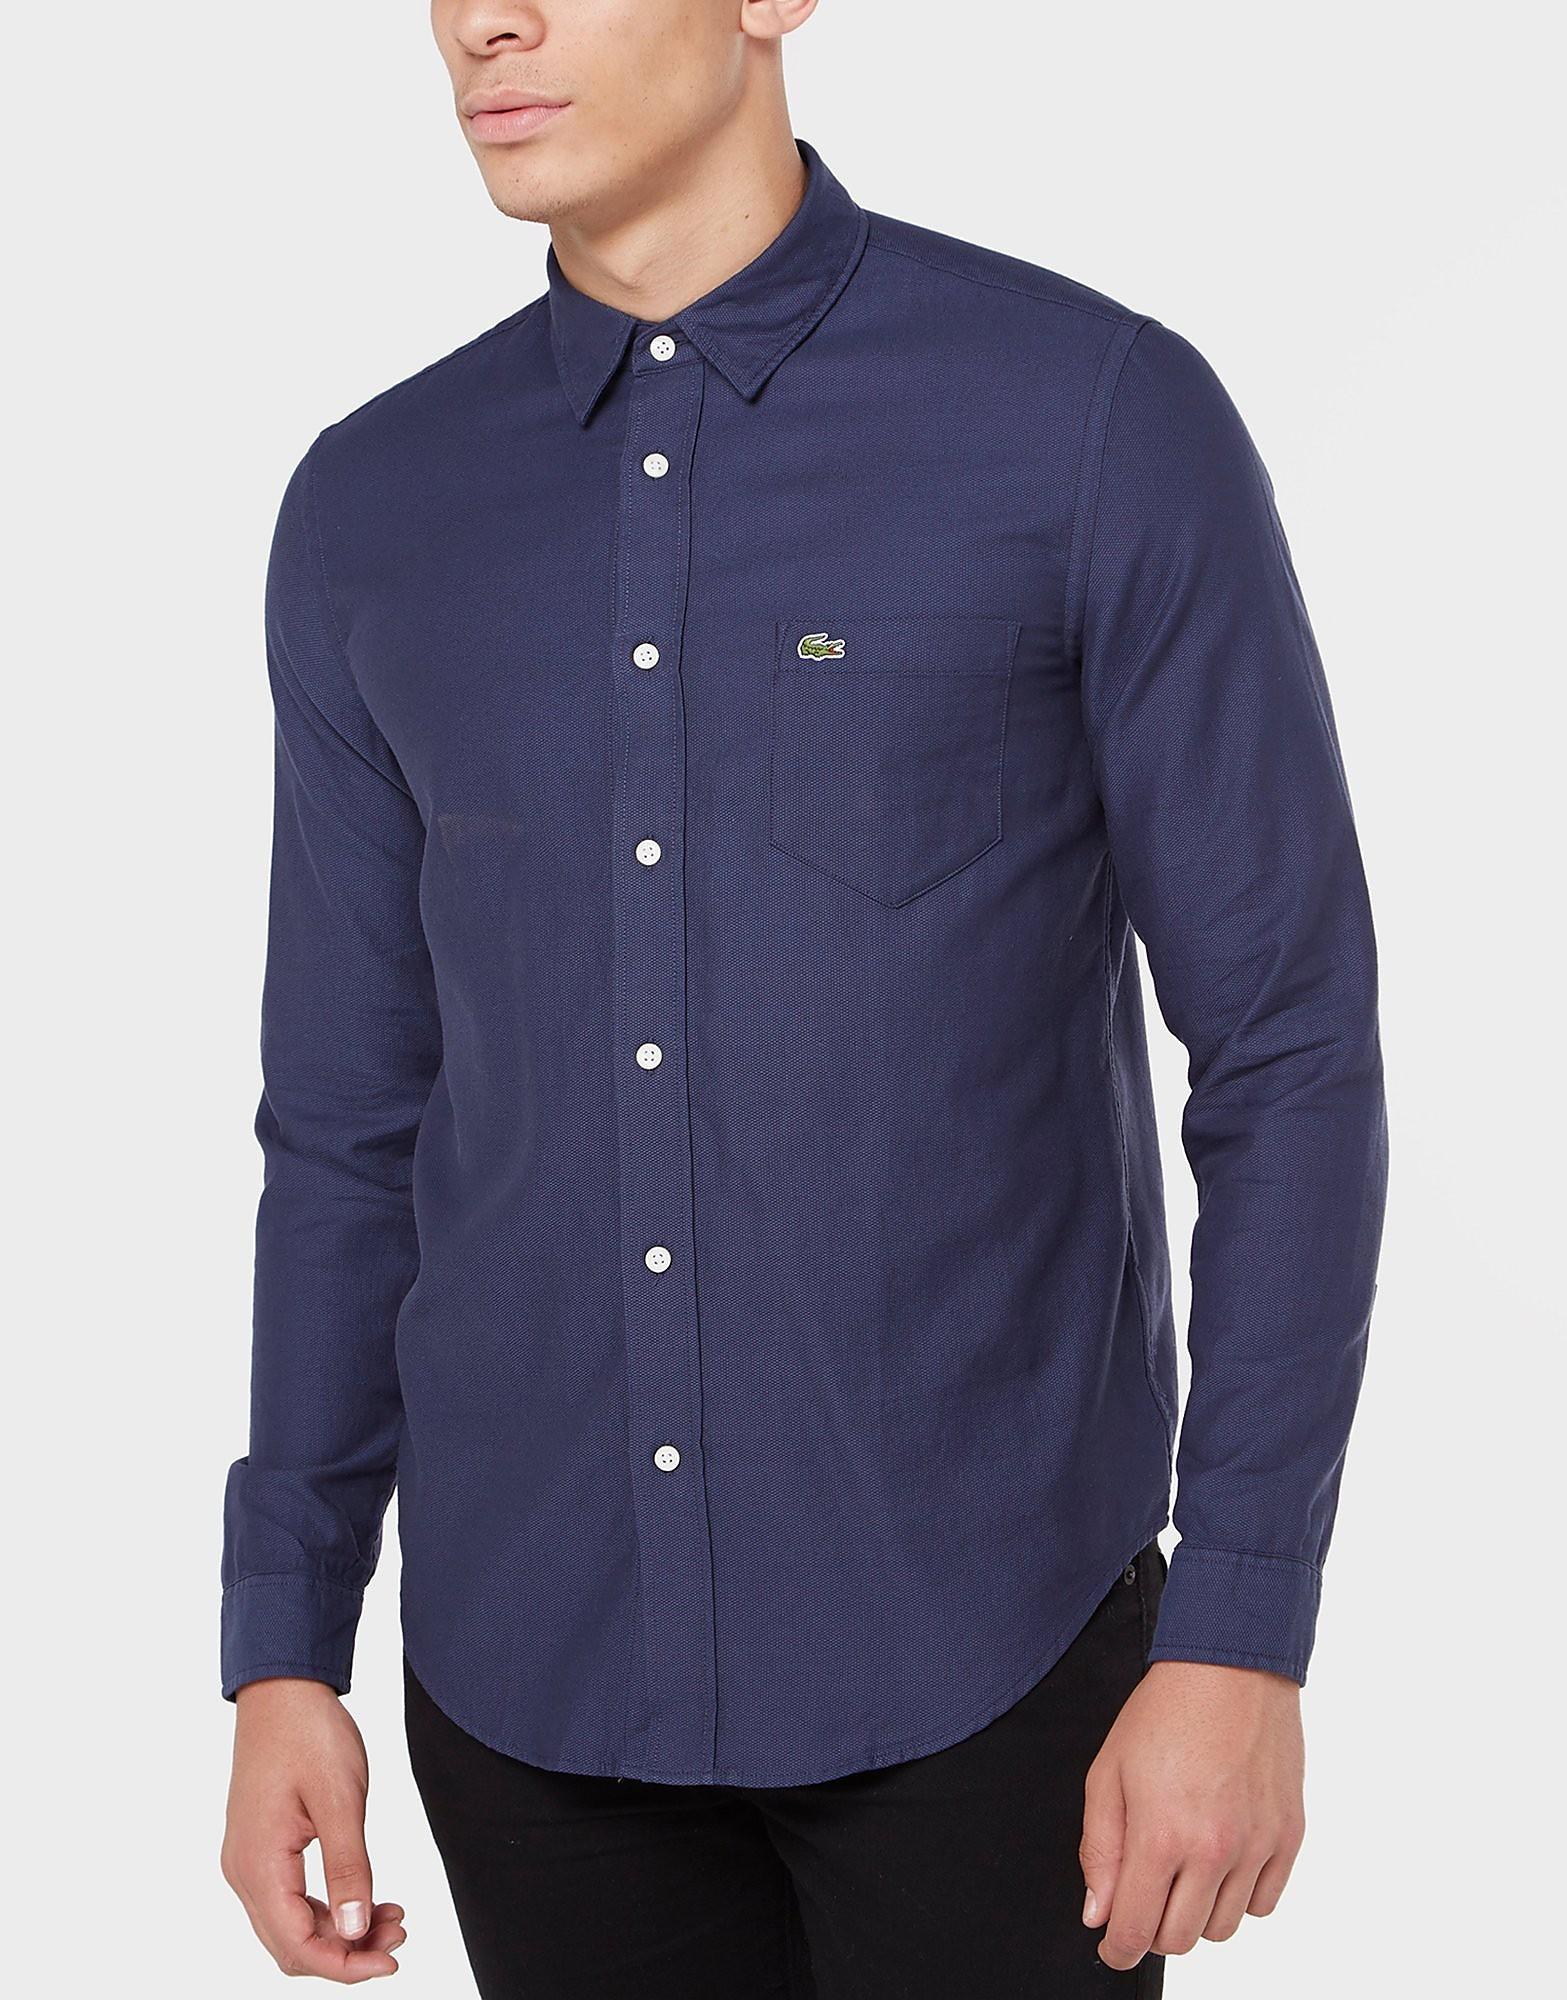 Lacoste Pique Long Sleeve Shirt